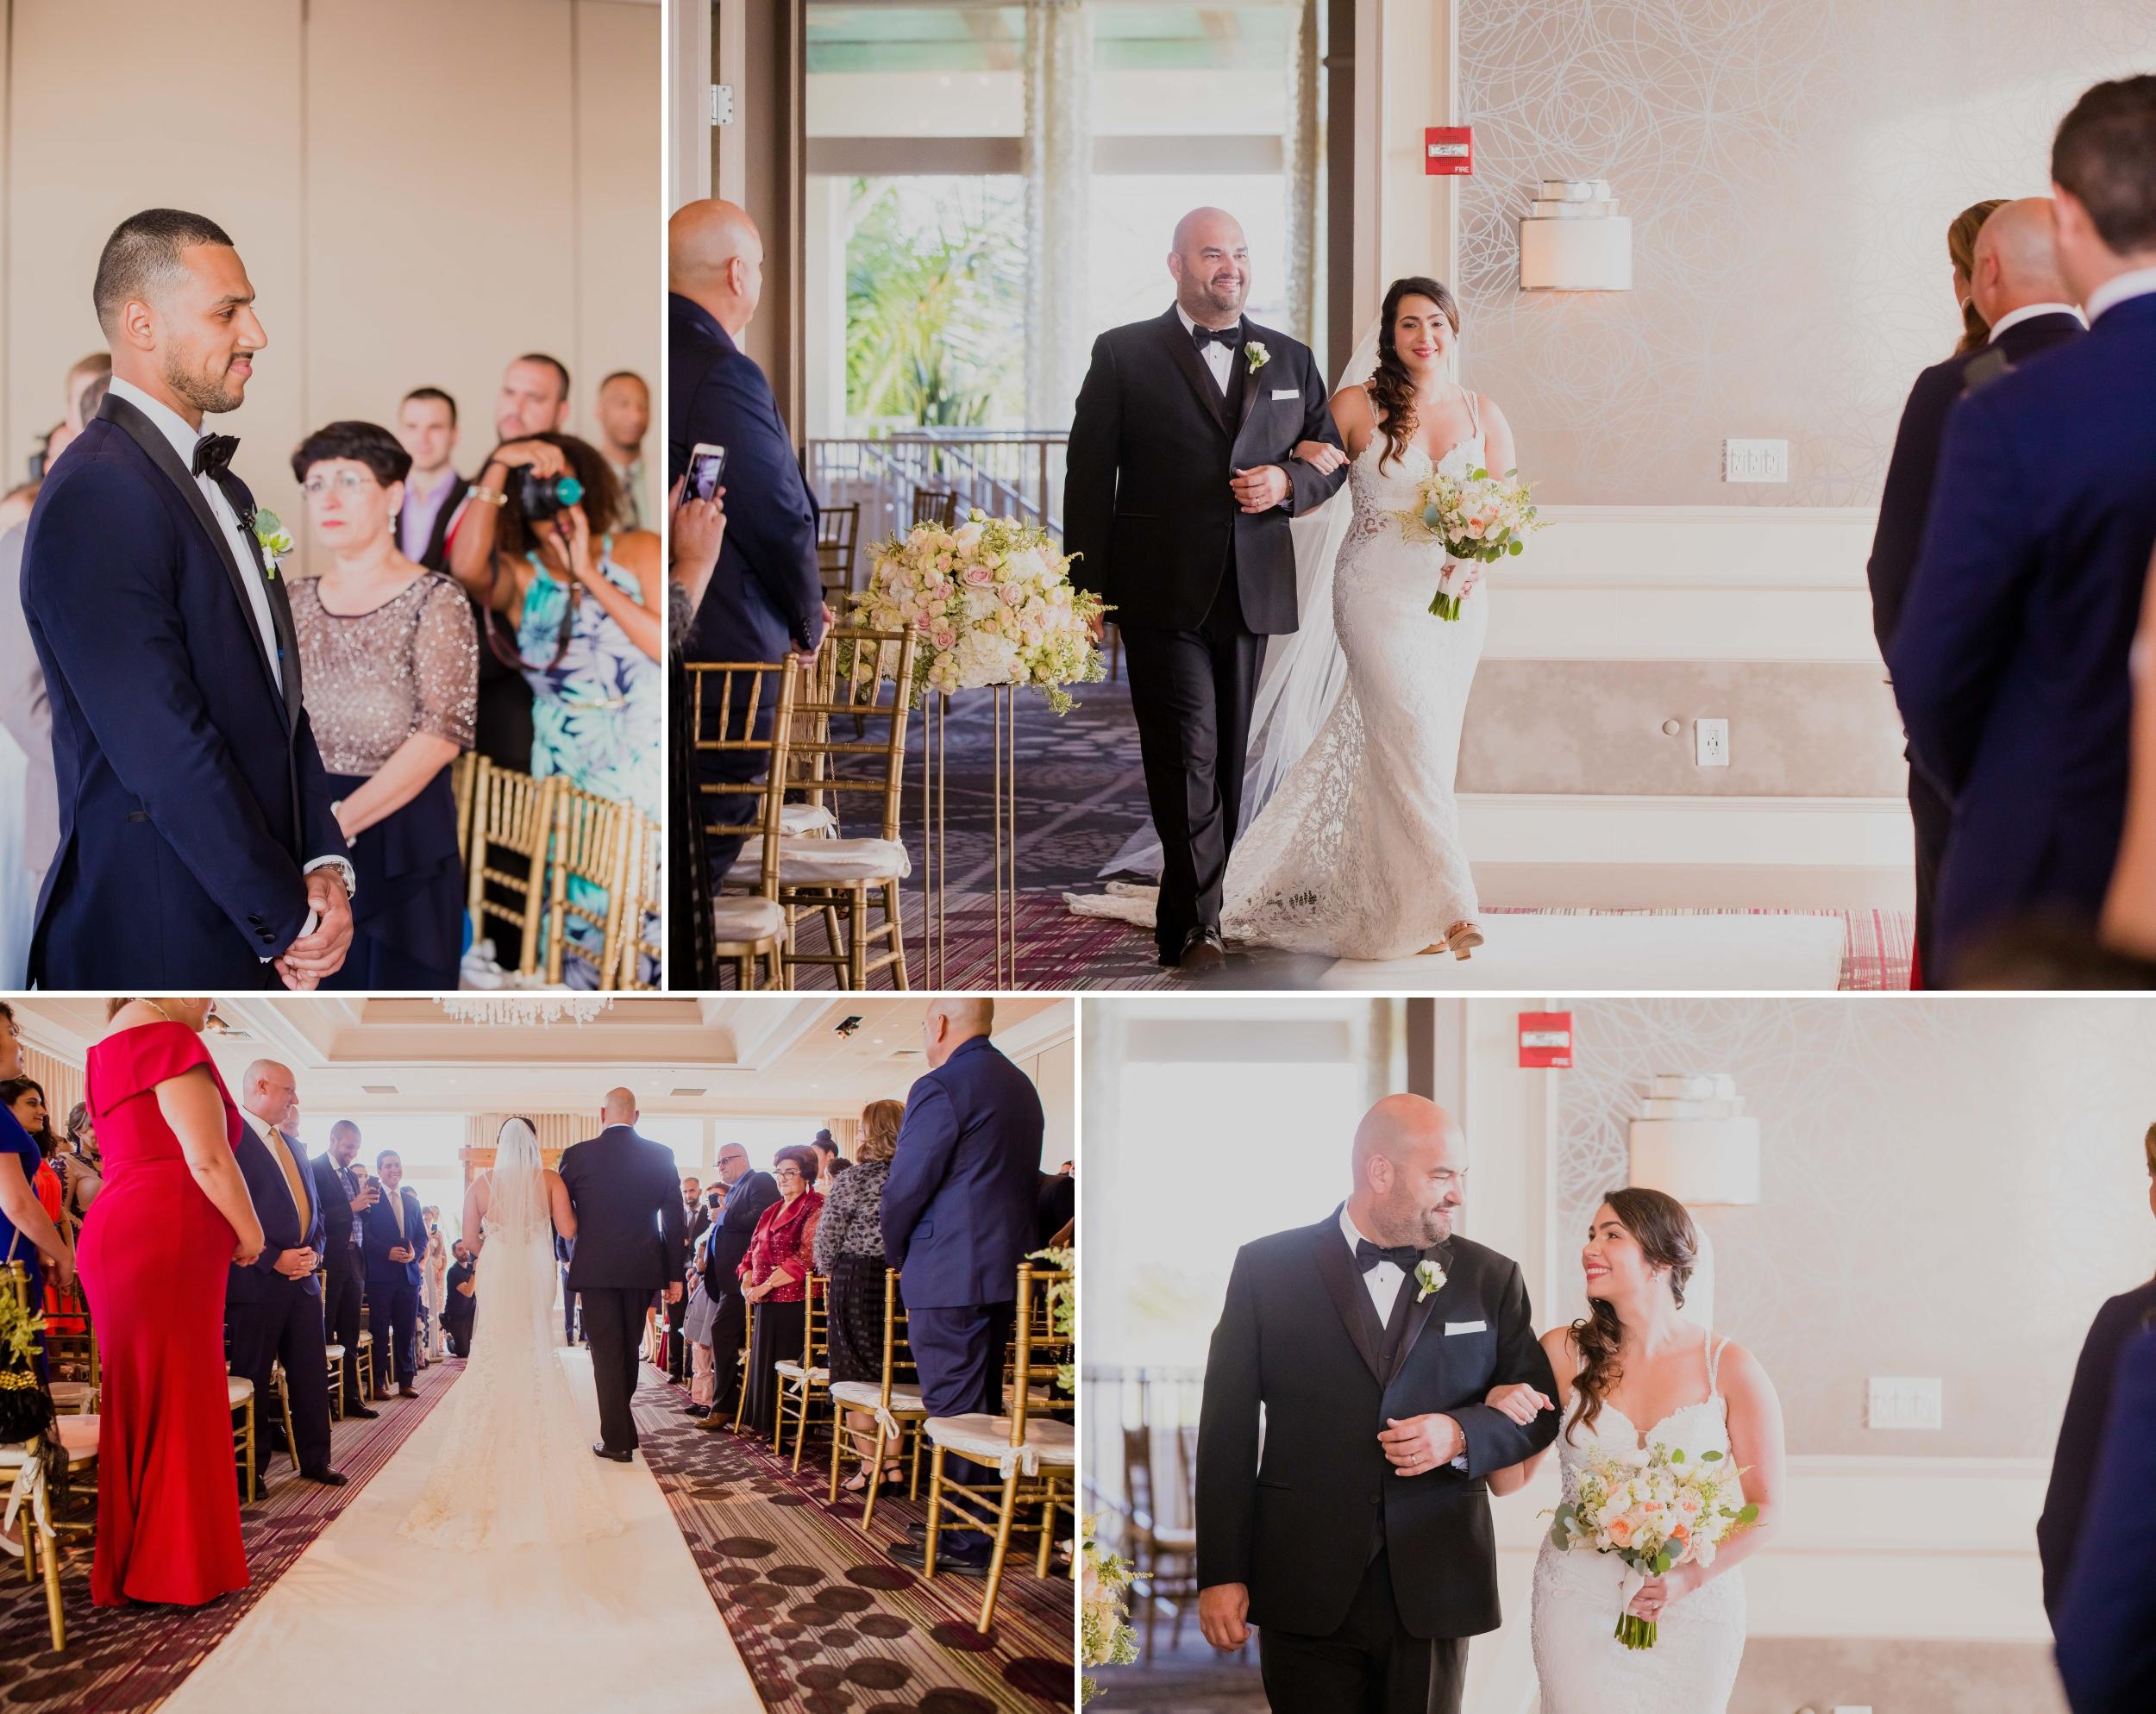 Wedding - Rusty Pelican - Key Biscayne - Santy Martinez Photography 28.jpg